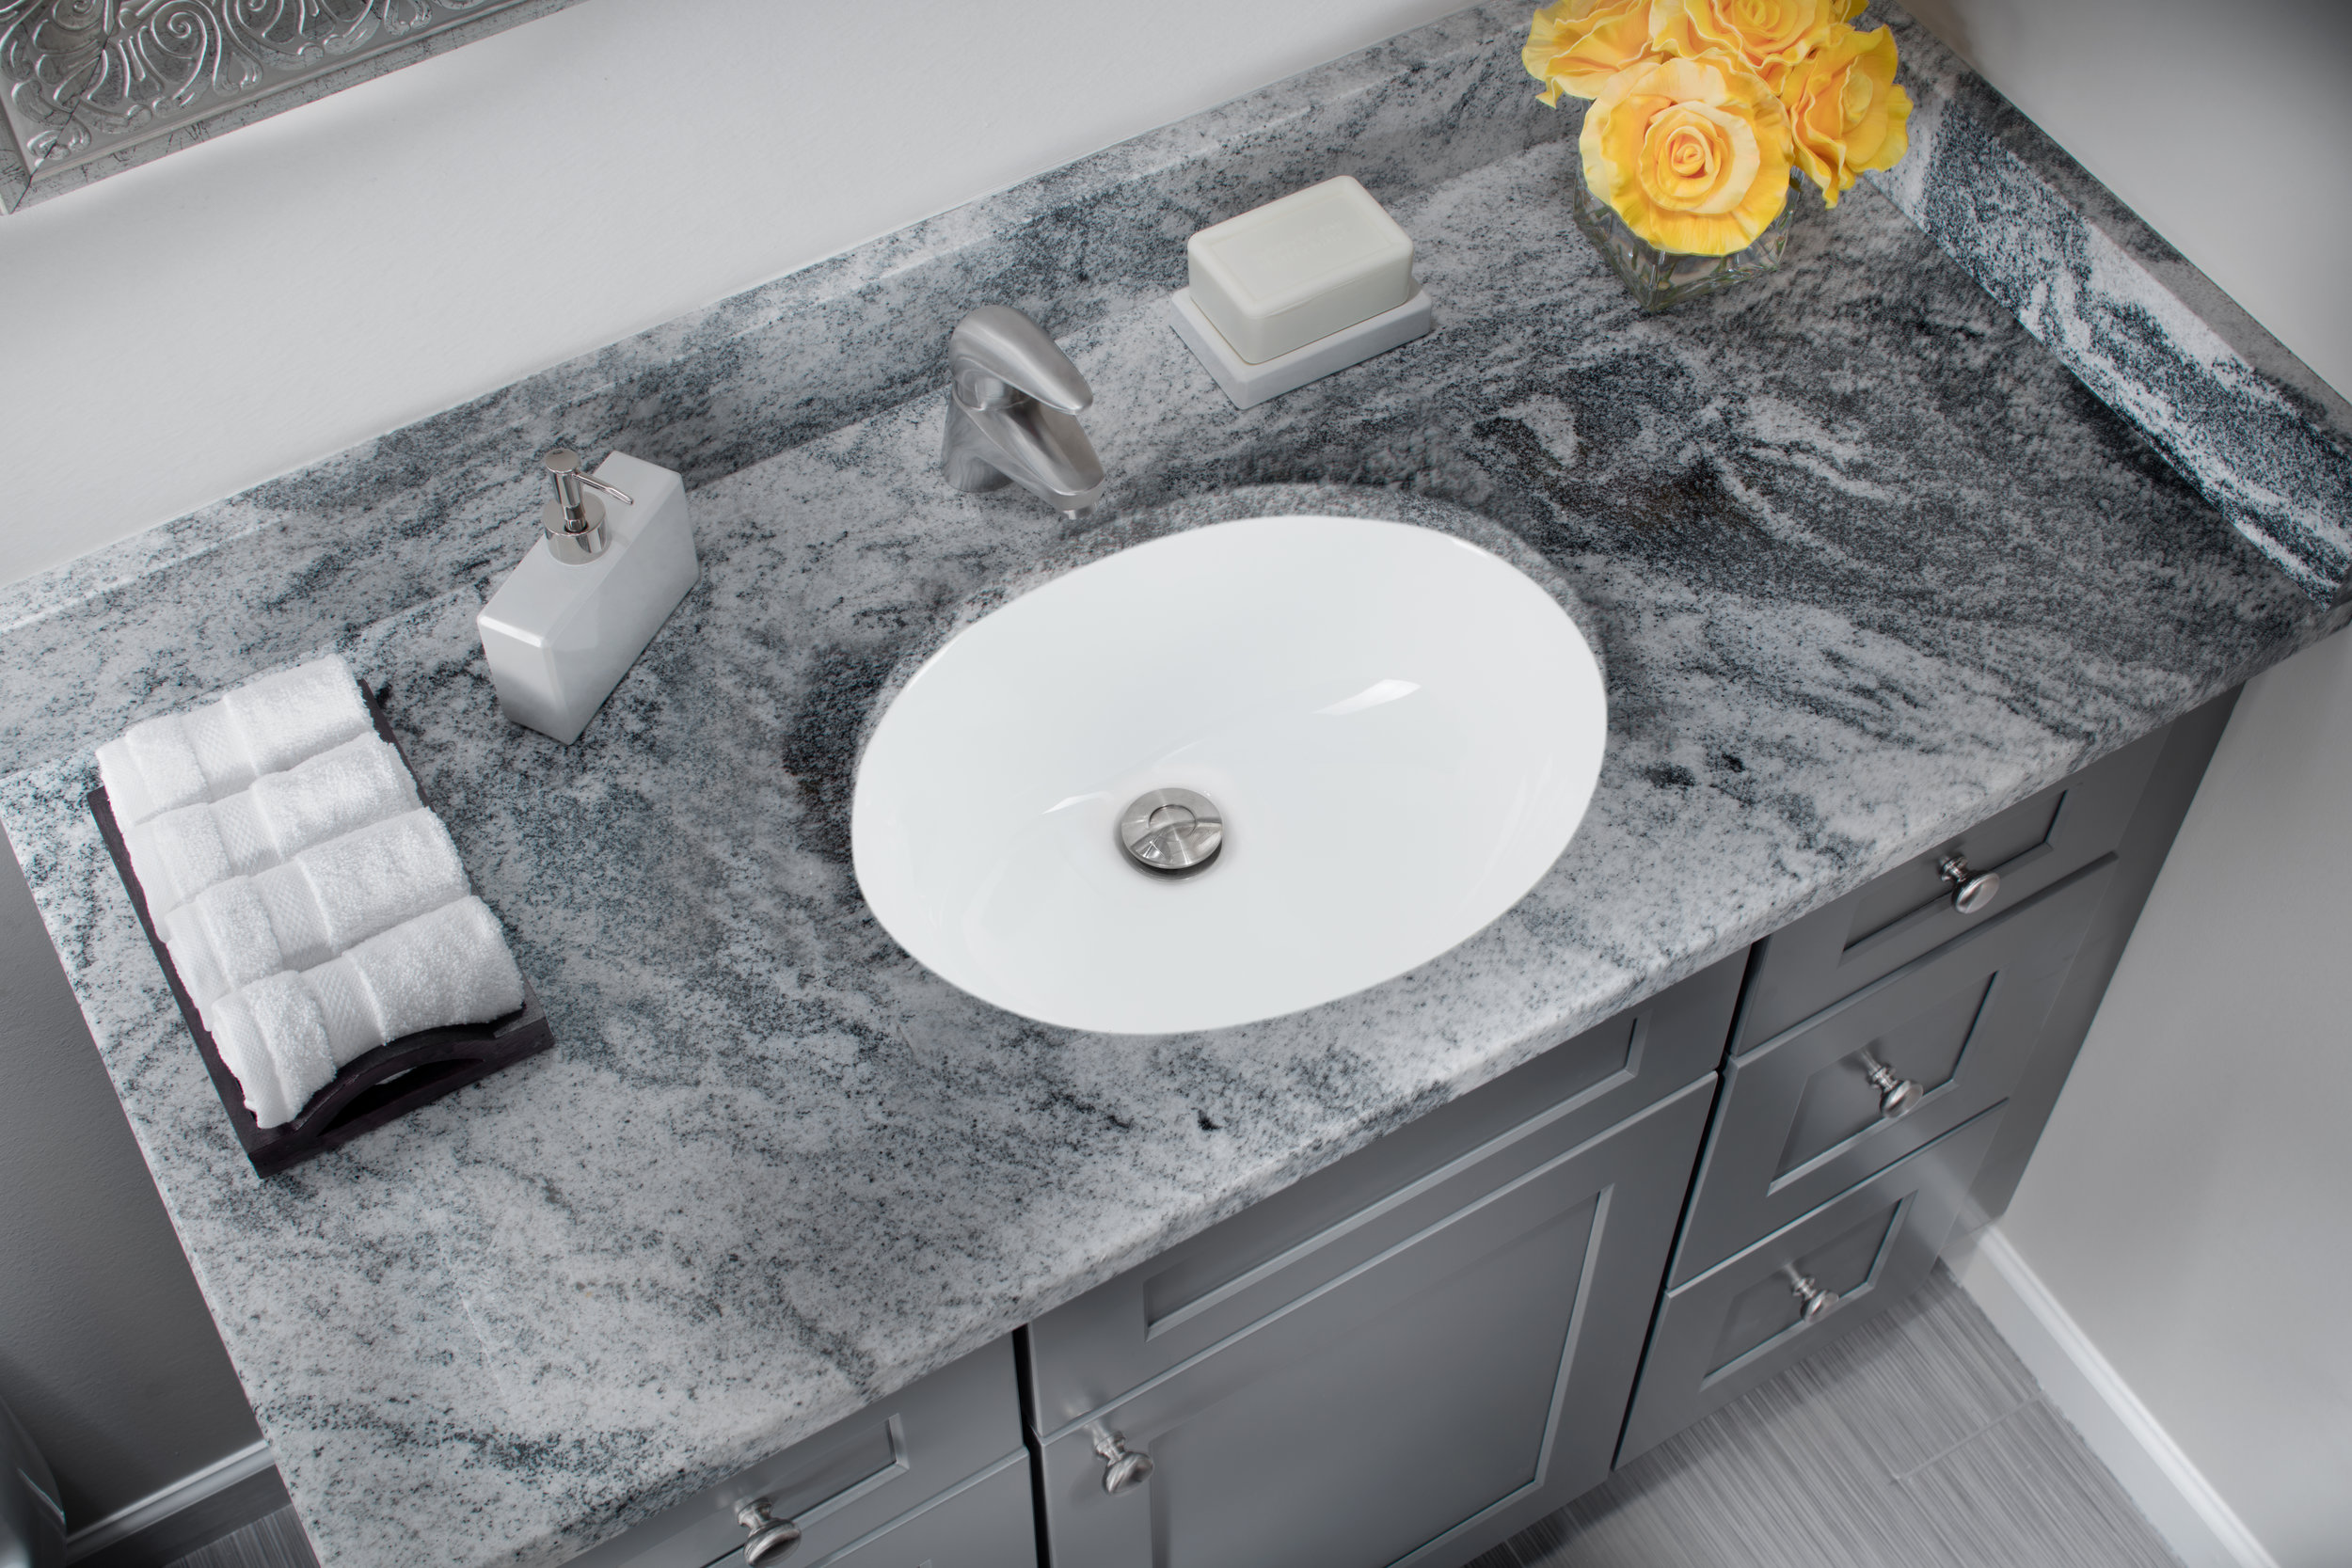 19 1 4 in glazed porcelain oval bathroom sink in white cahaba designs